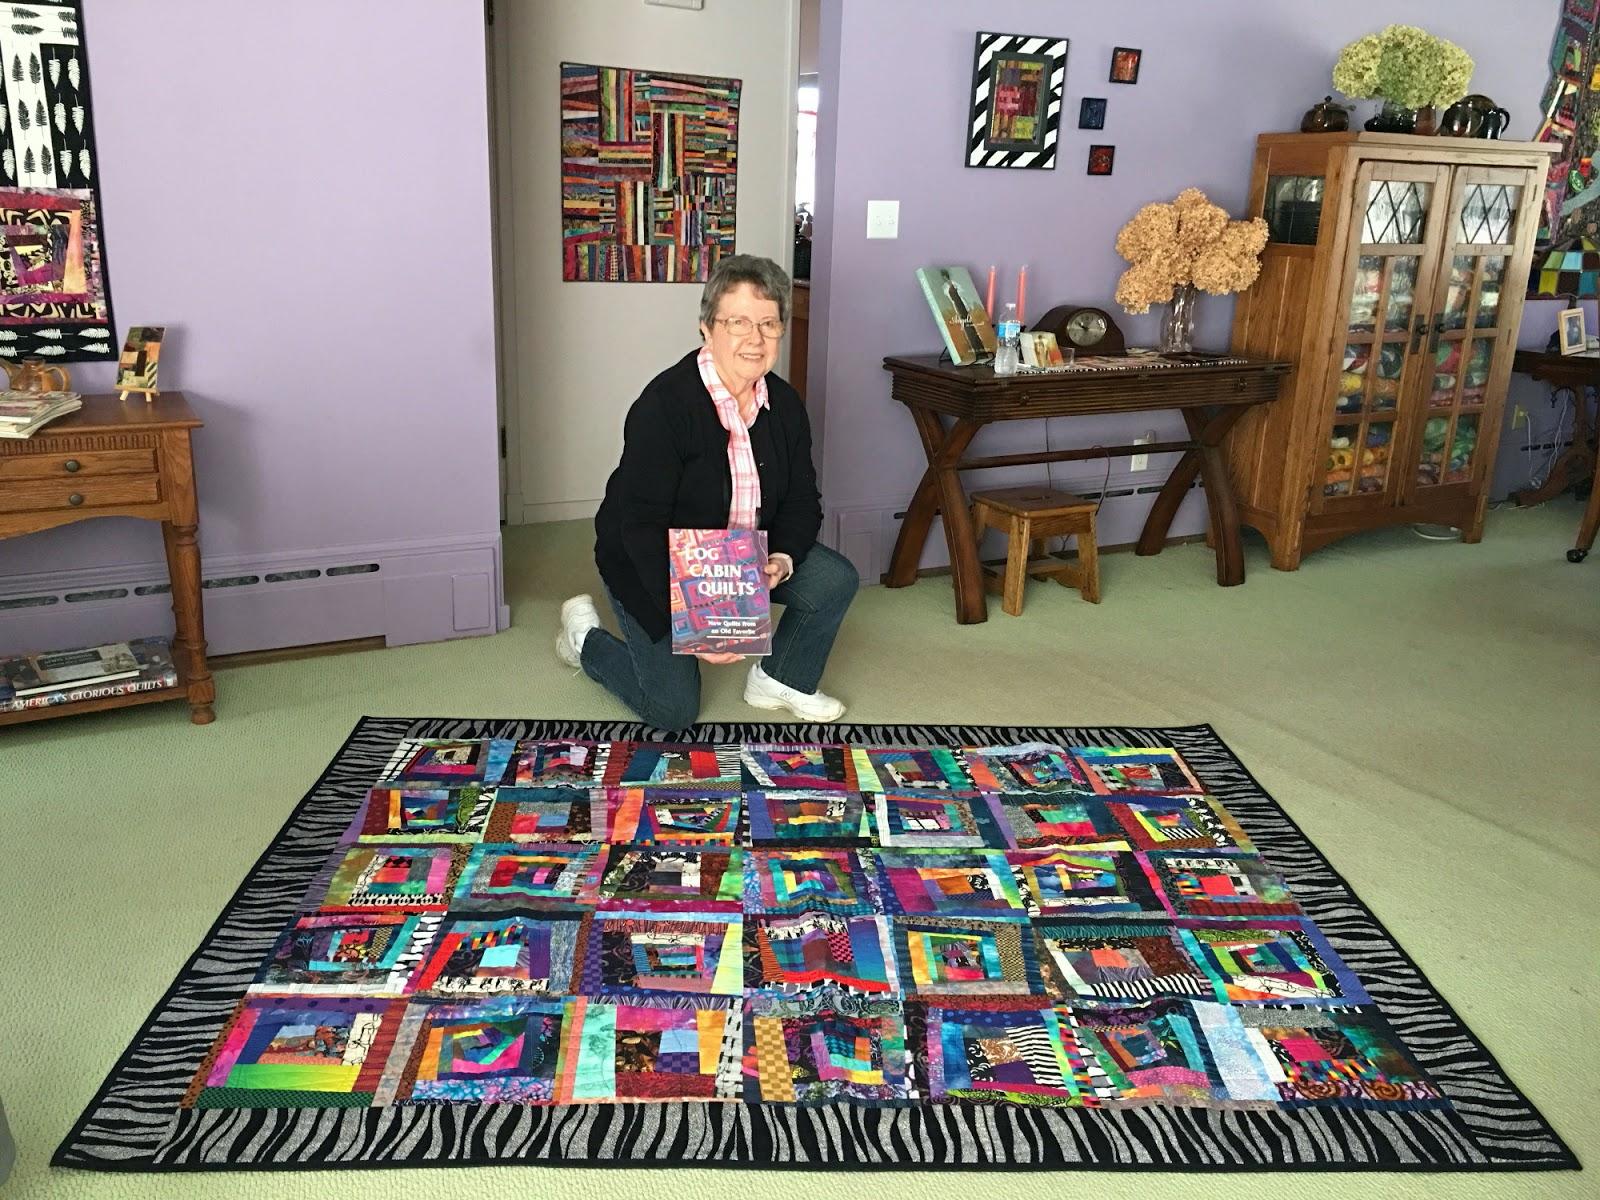 Wanda S. Hanson Exuberance with me and book.jpg